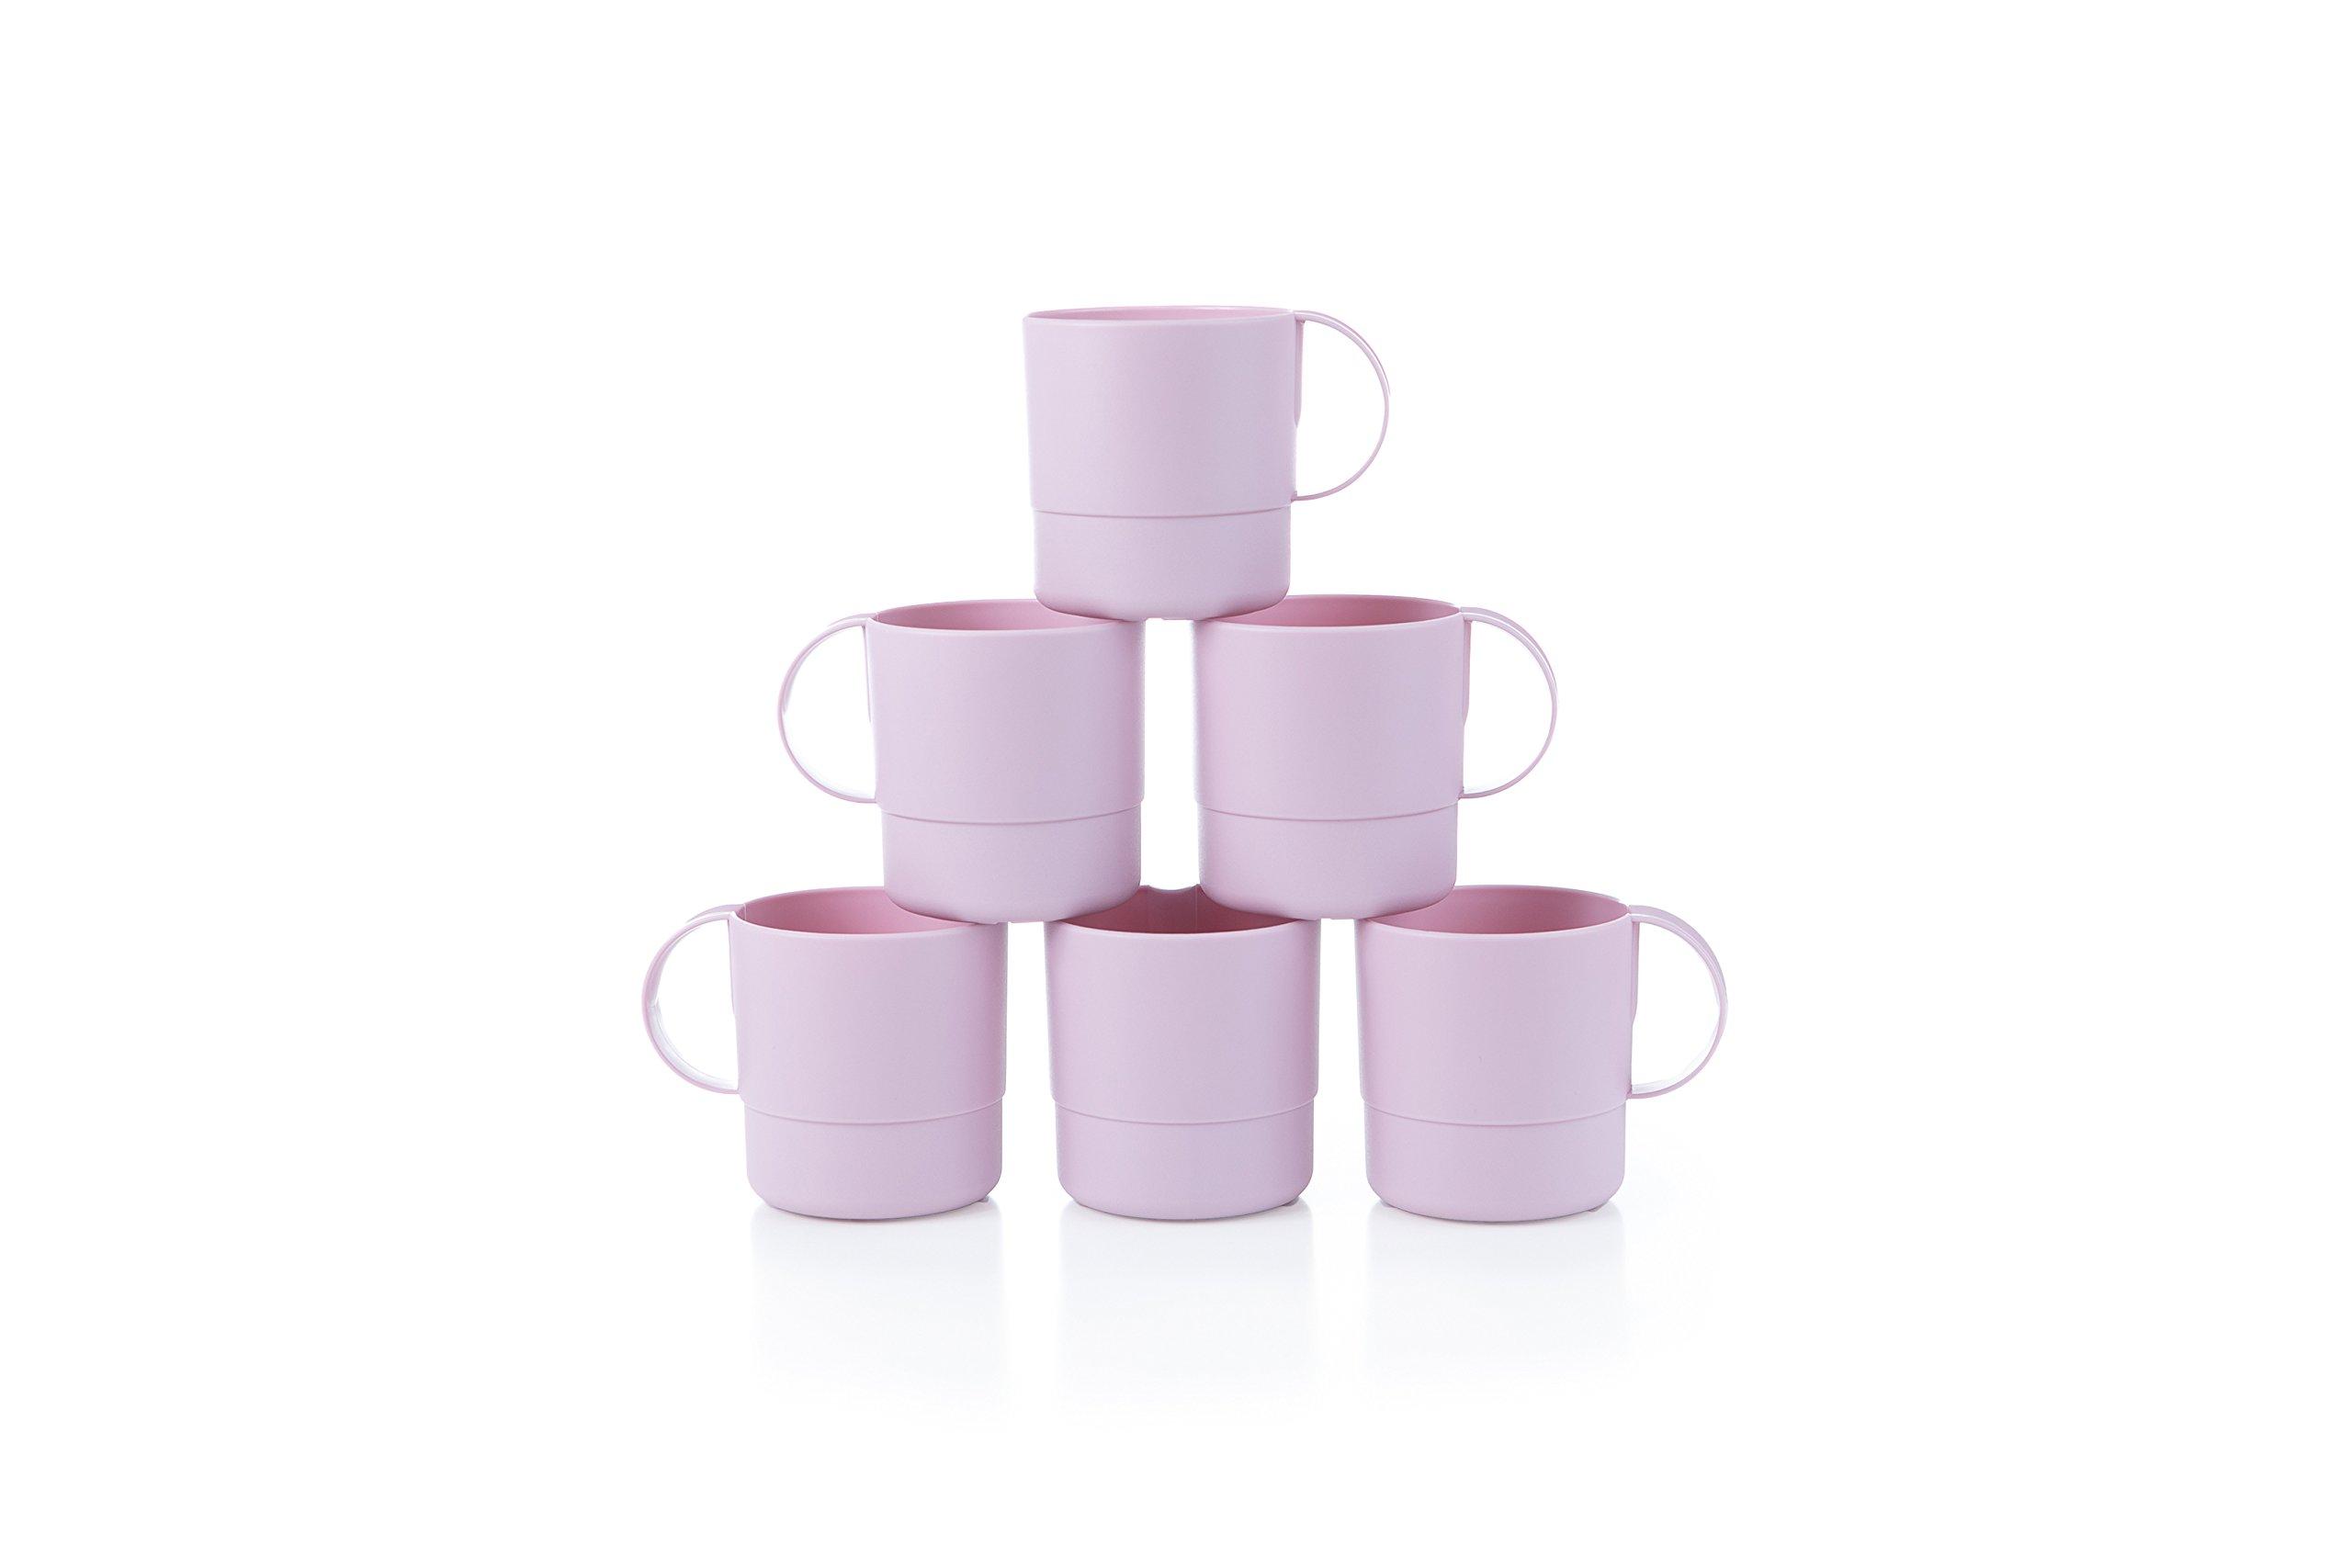 Amuse- Eco Friendly Sturdy Unbreakable & Stackable Mugs for Water, Coffee, Milk, Juice, Tea- Set of 6-11 oz (Purple)